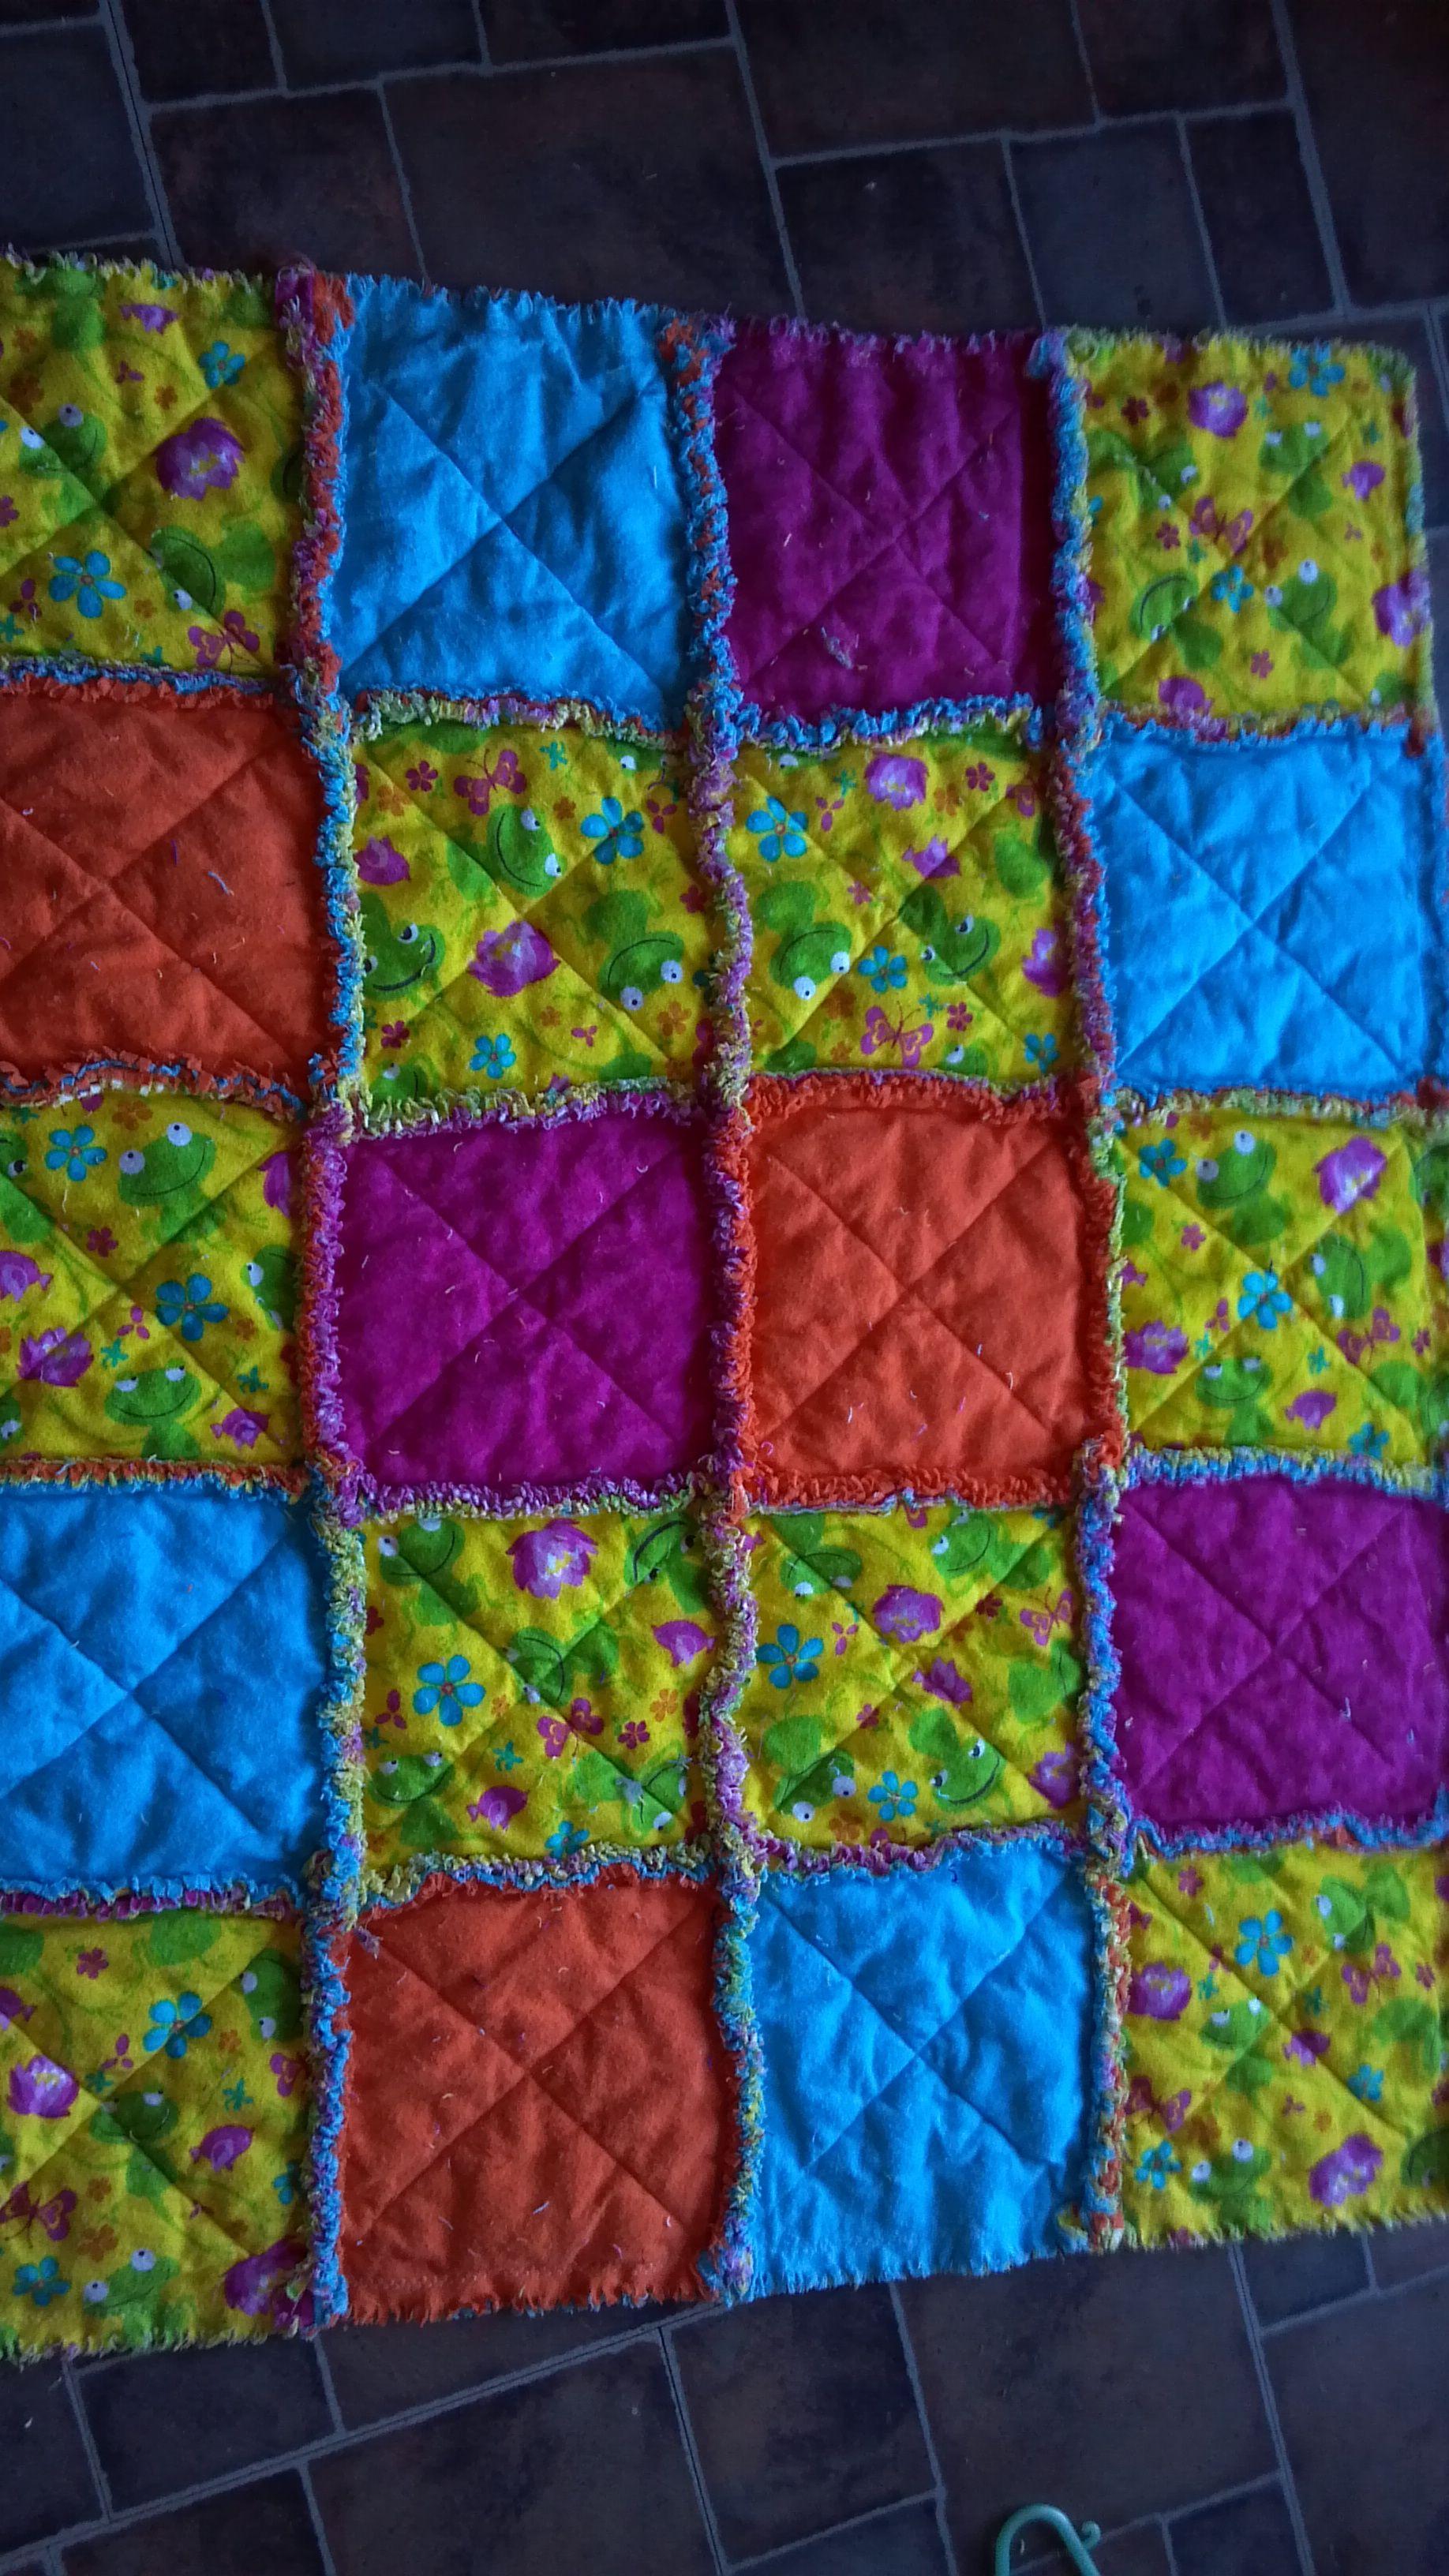 Rag Quilt Ideas Pinterest : flannel rag quilt quilting Ideas and favs Pinterest